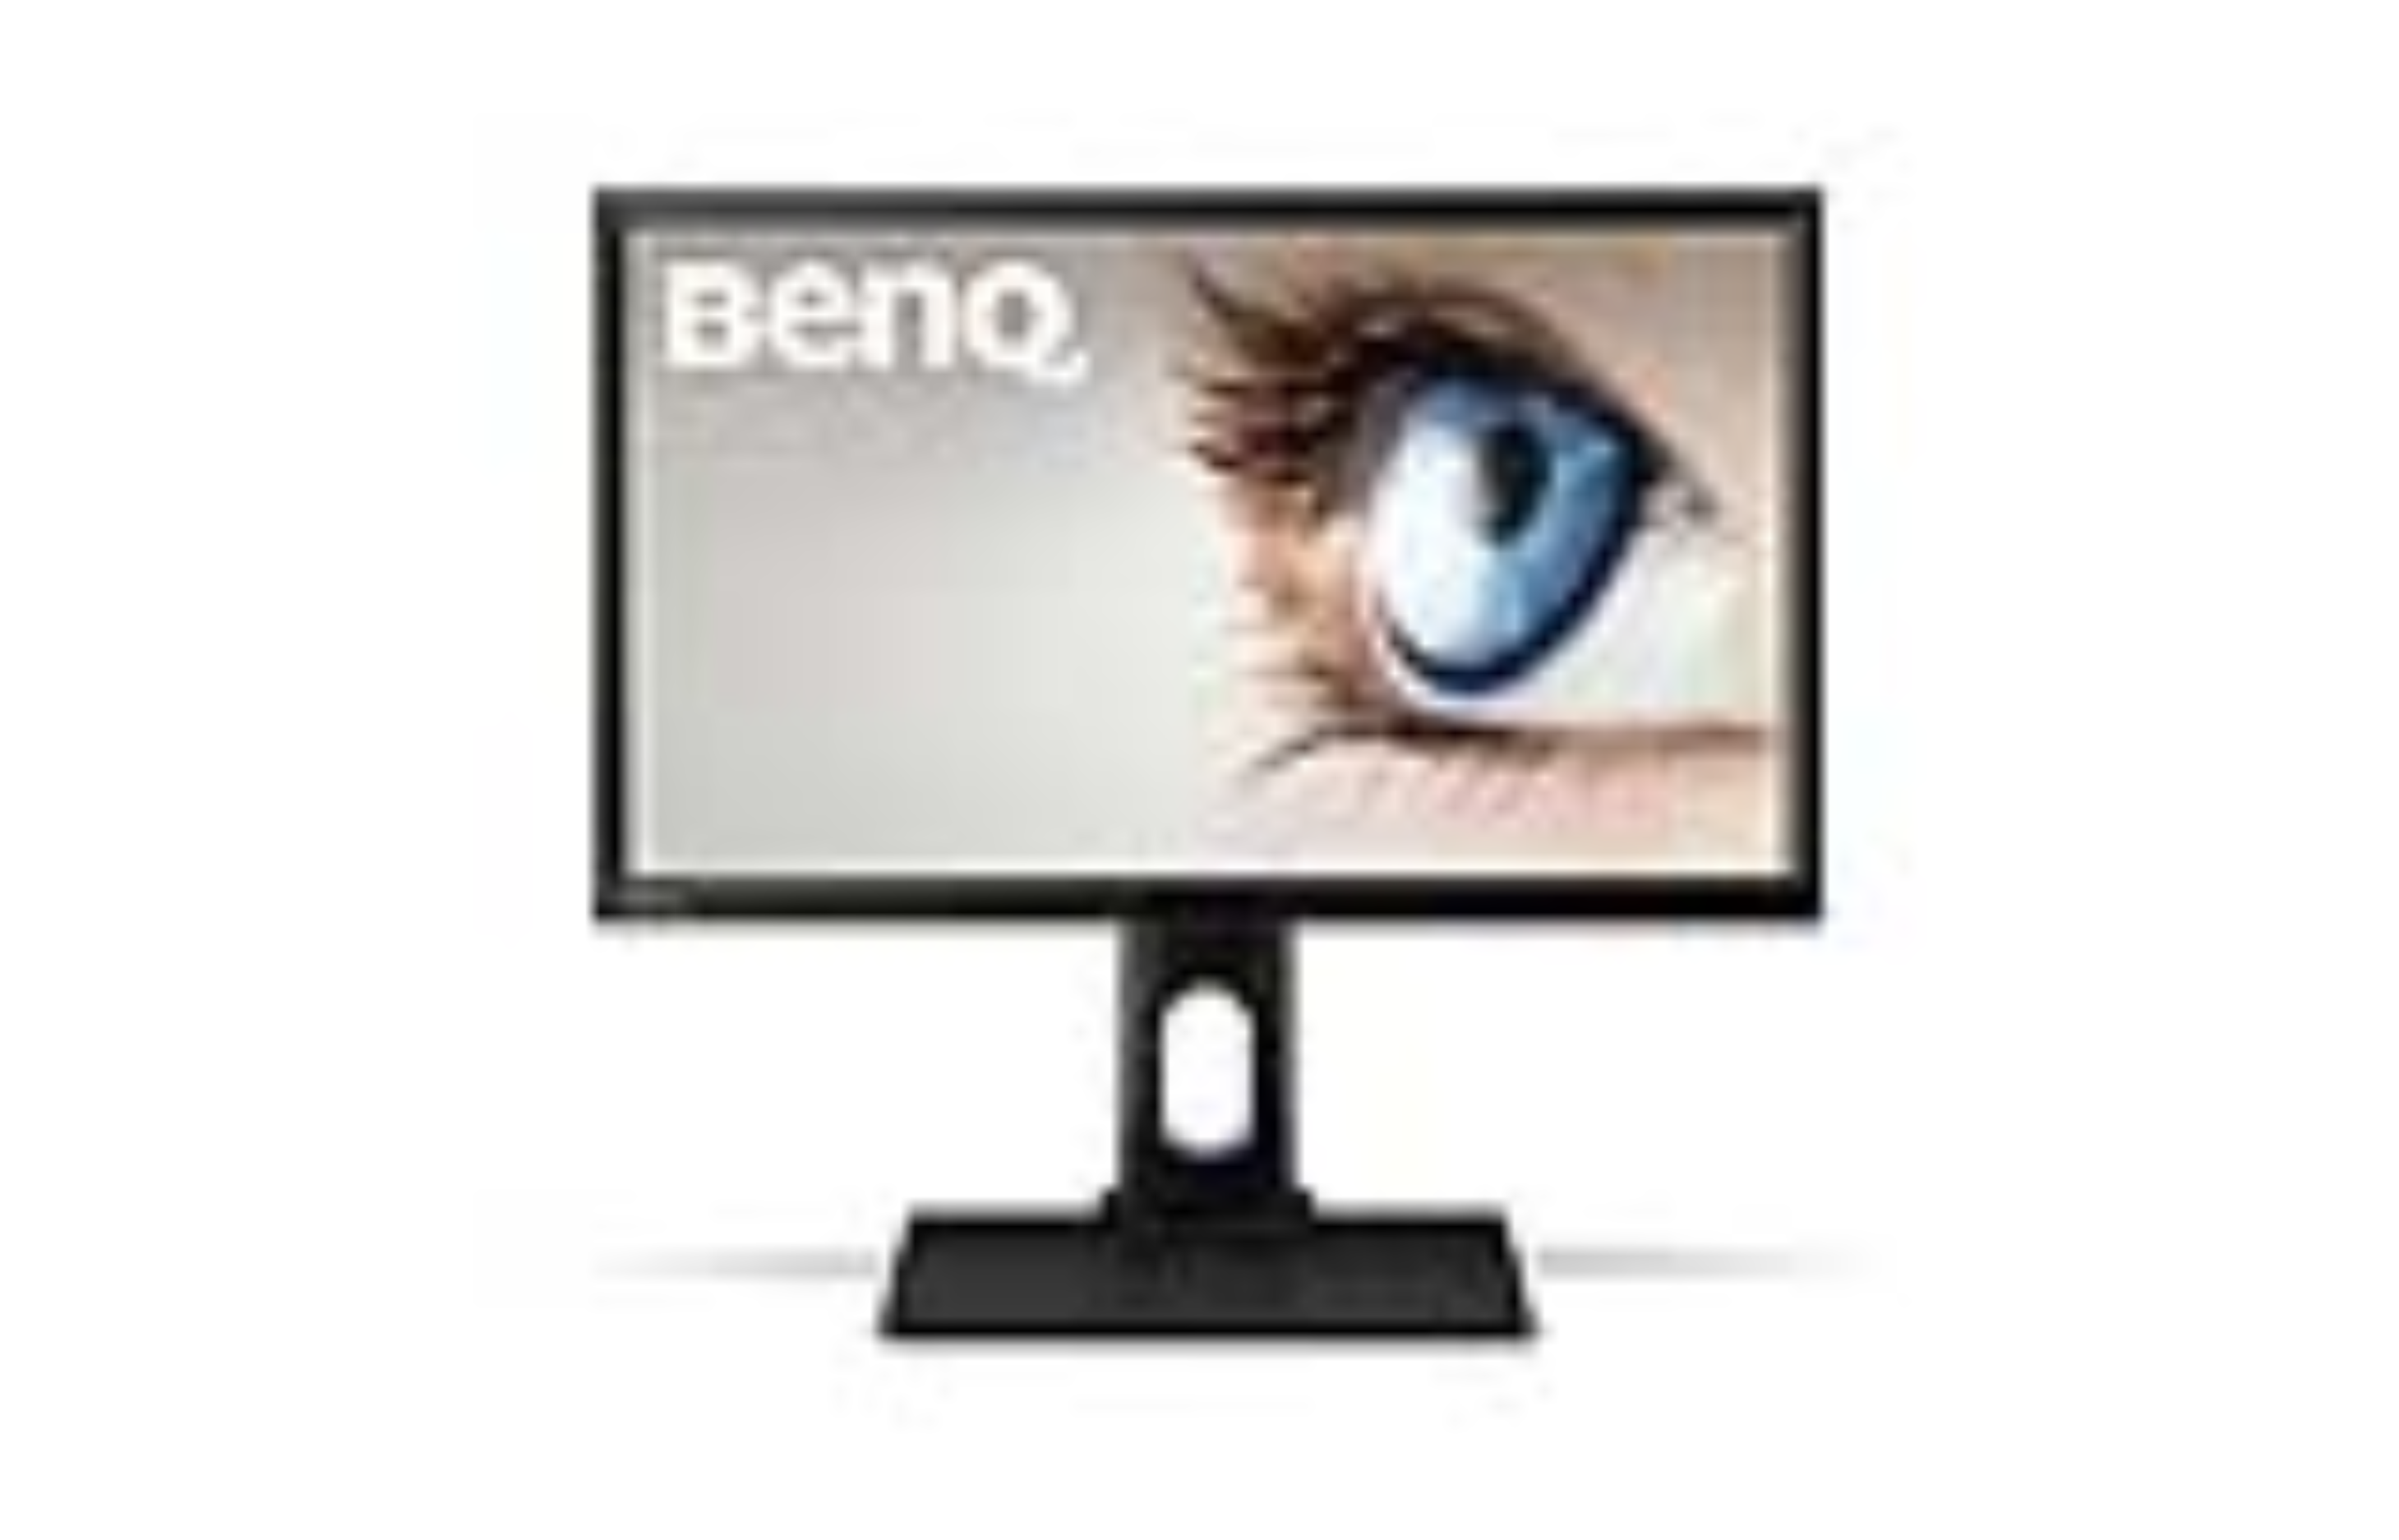 "BenQ LCD BL2423PT 23,8""w/LED IPS/1920x1080/20M:1/6 ms/D-sub/DVI/DP1.2/2xUSB 2.0/Repro/HAS/Pivot/Swivel/VESA/TCO6/"